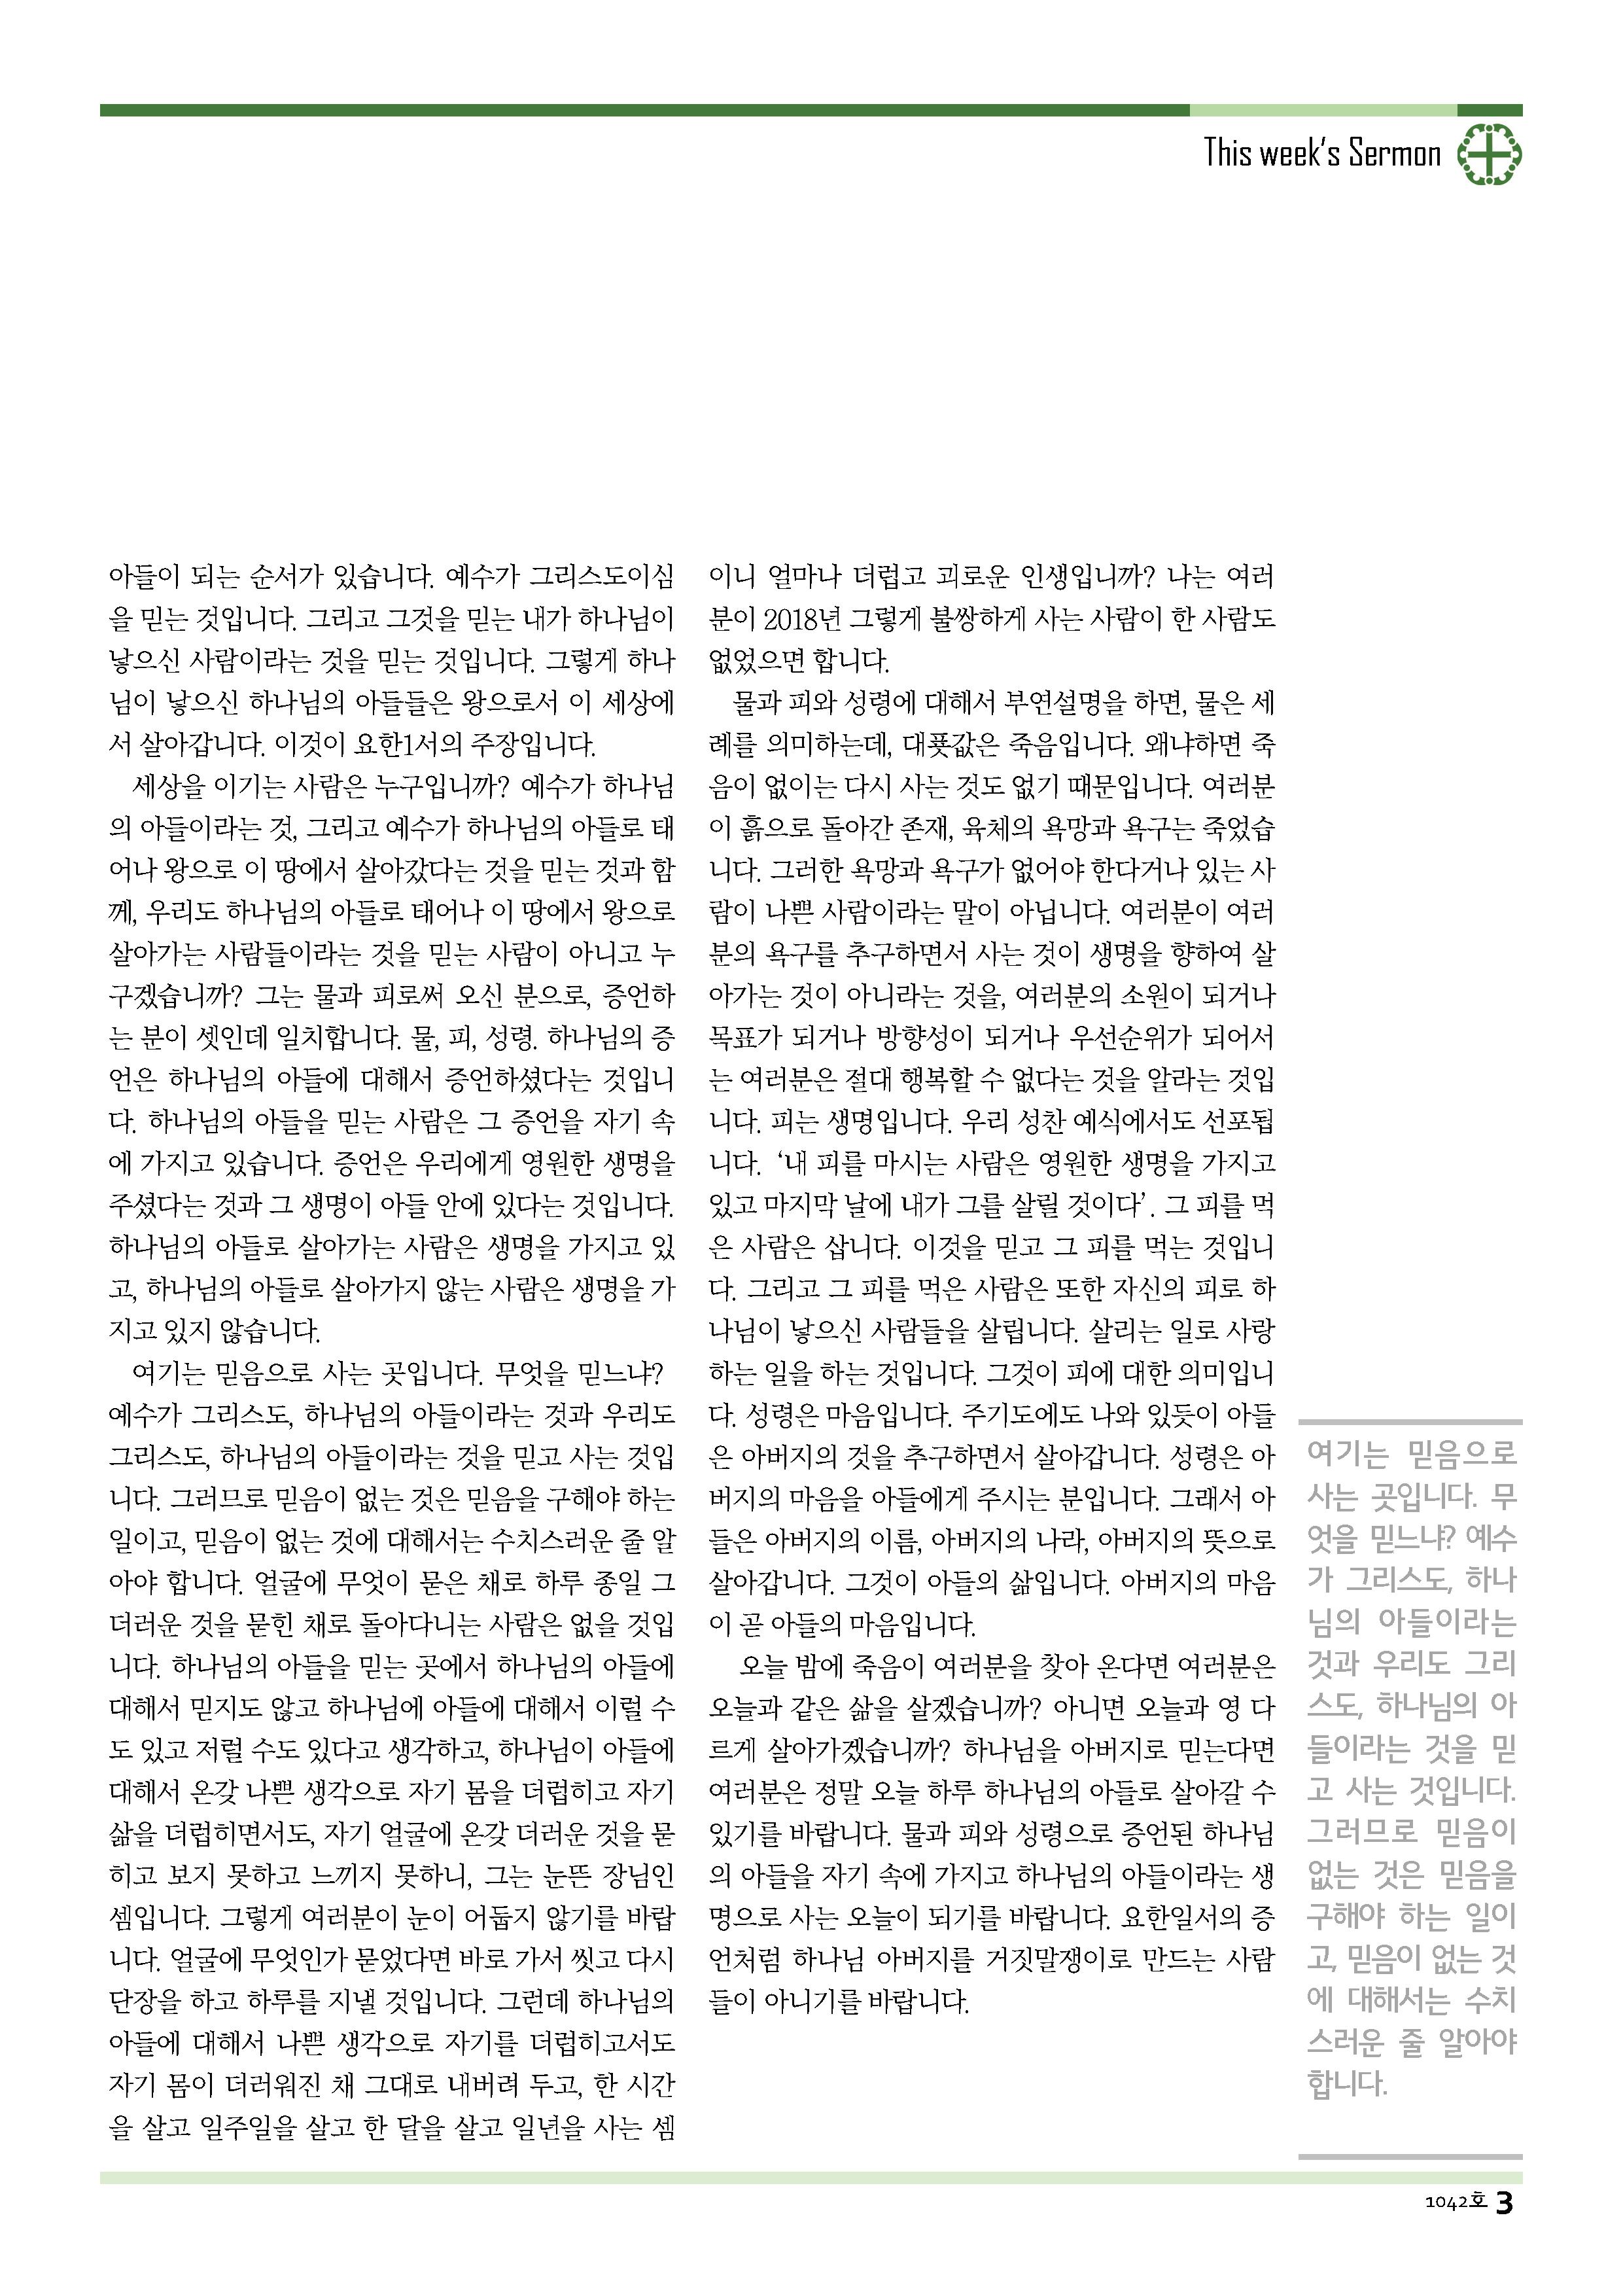 18sdjb0128_페이지_03.png